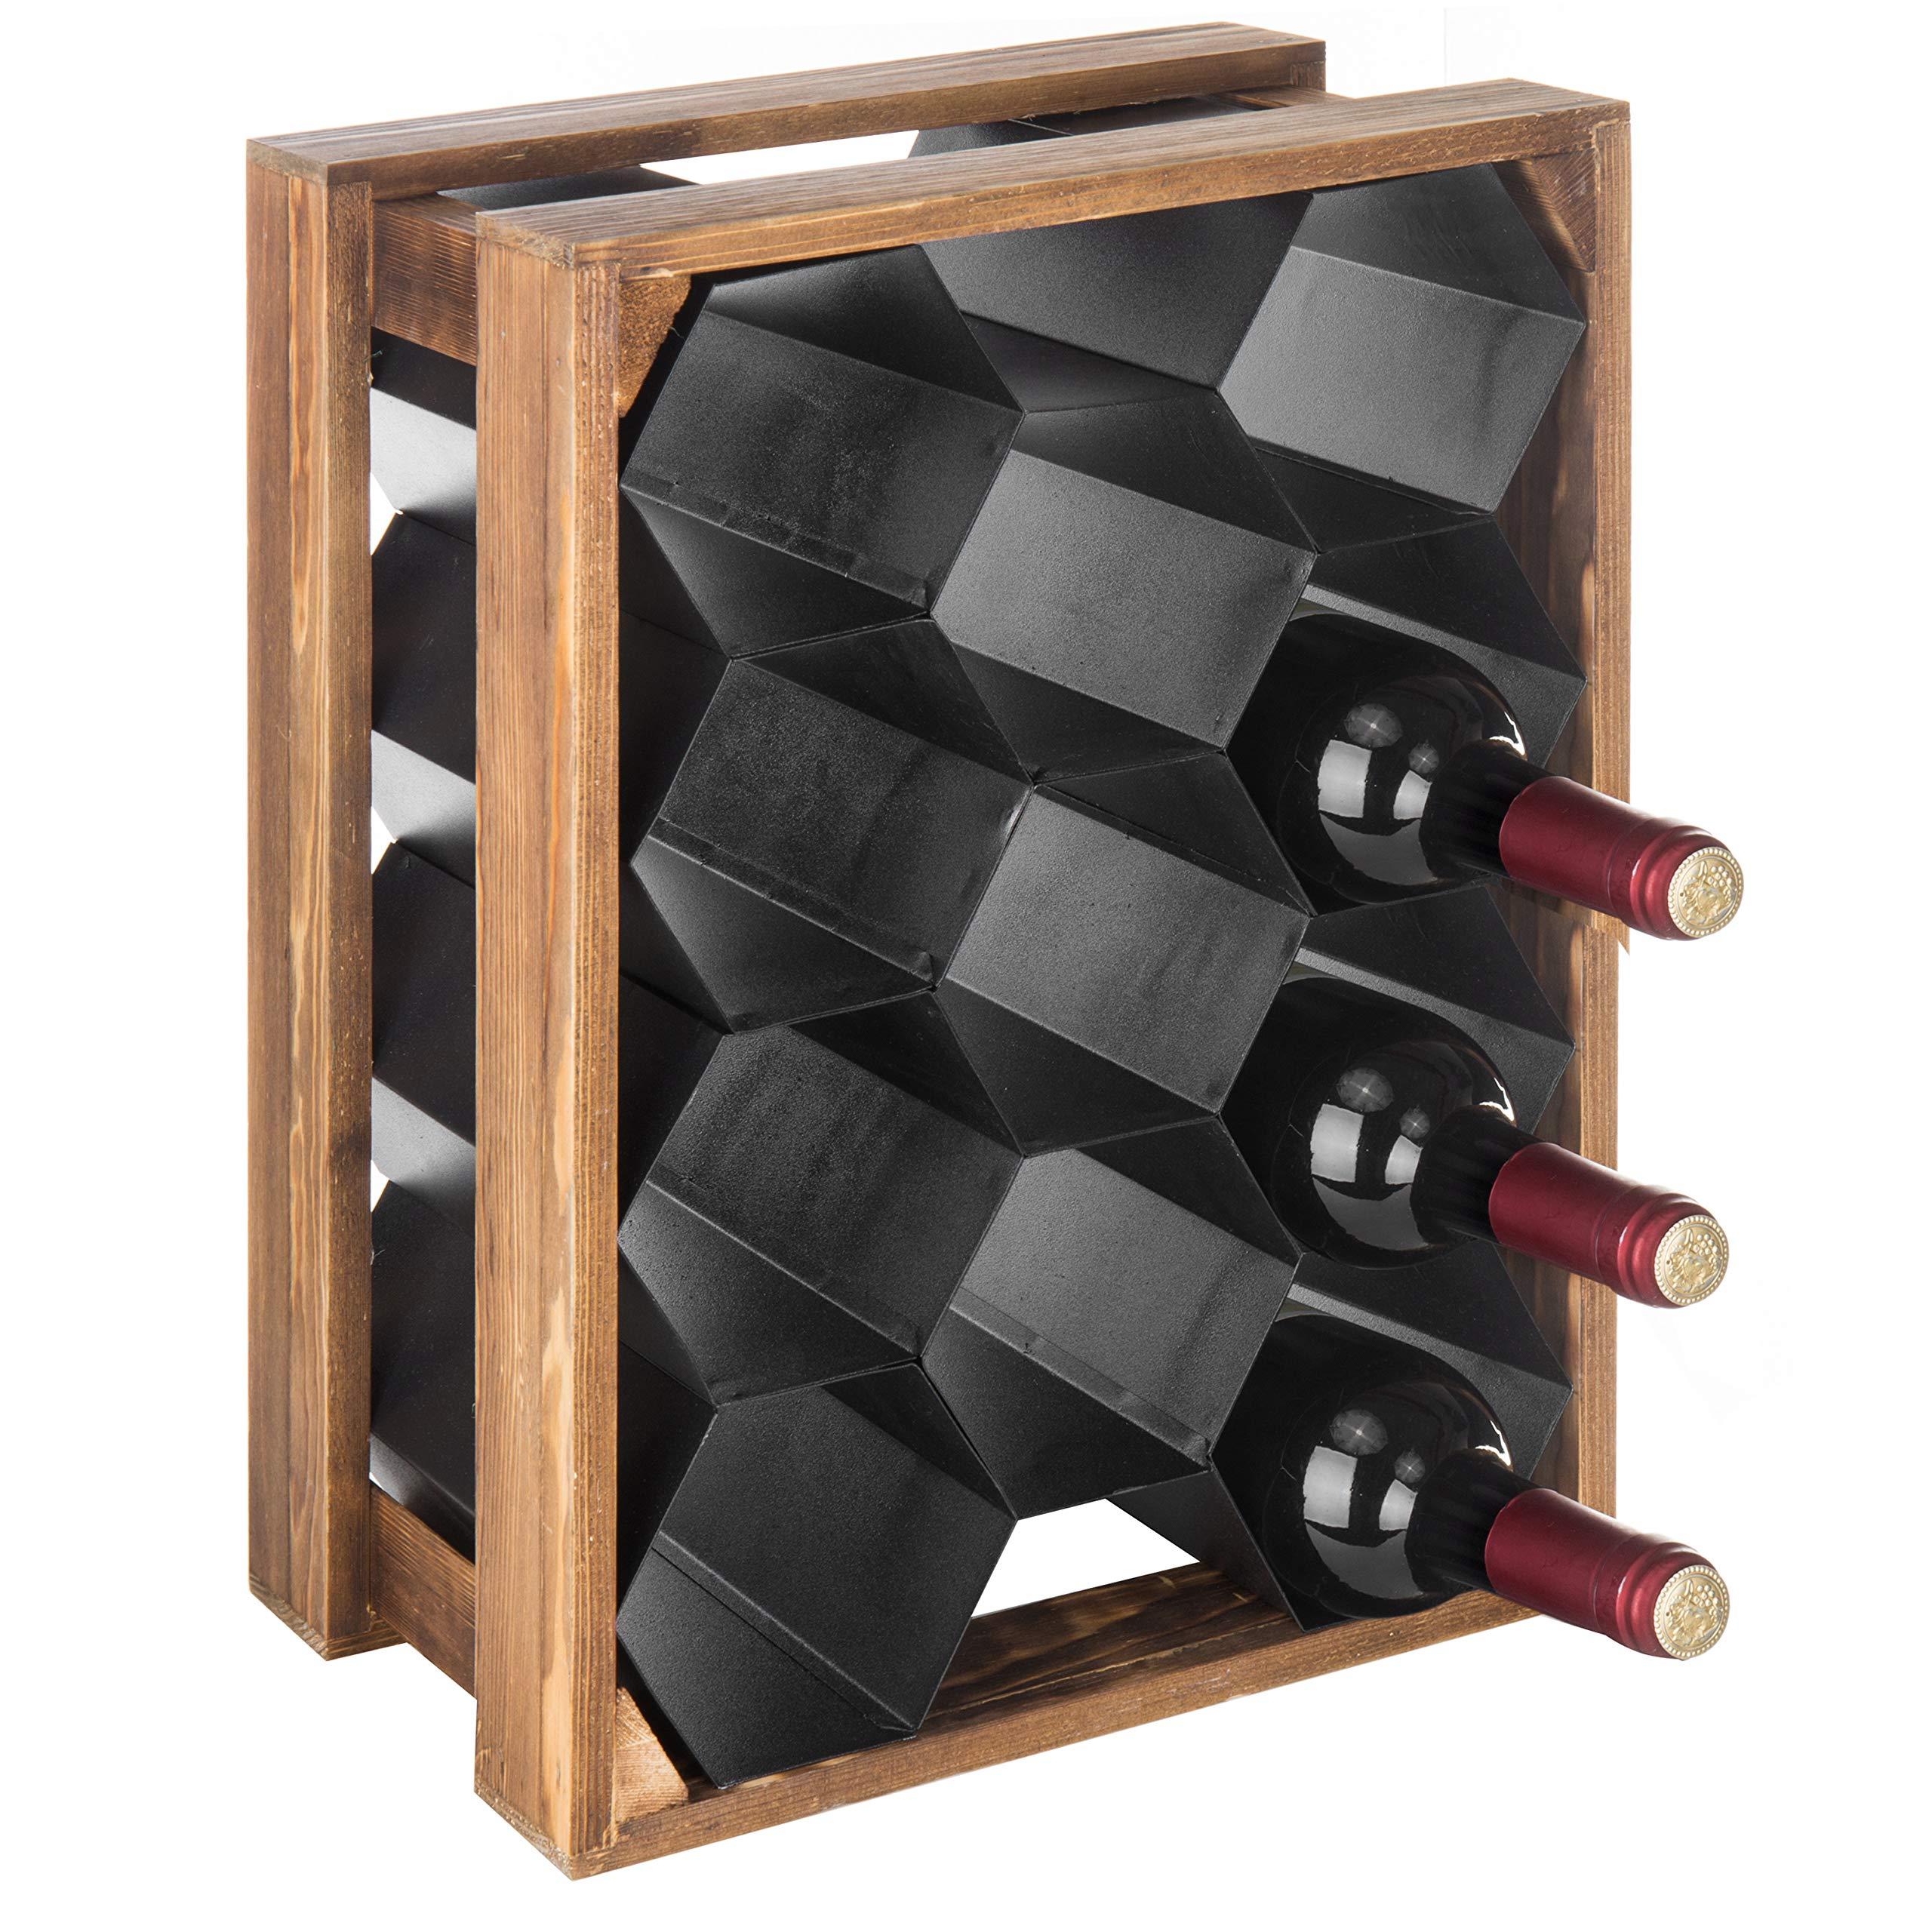 MyGift 11-Bottle Wood & Metal Countertop Honeycomb Design Wine Rack by MyGift